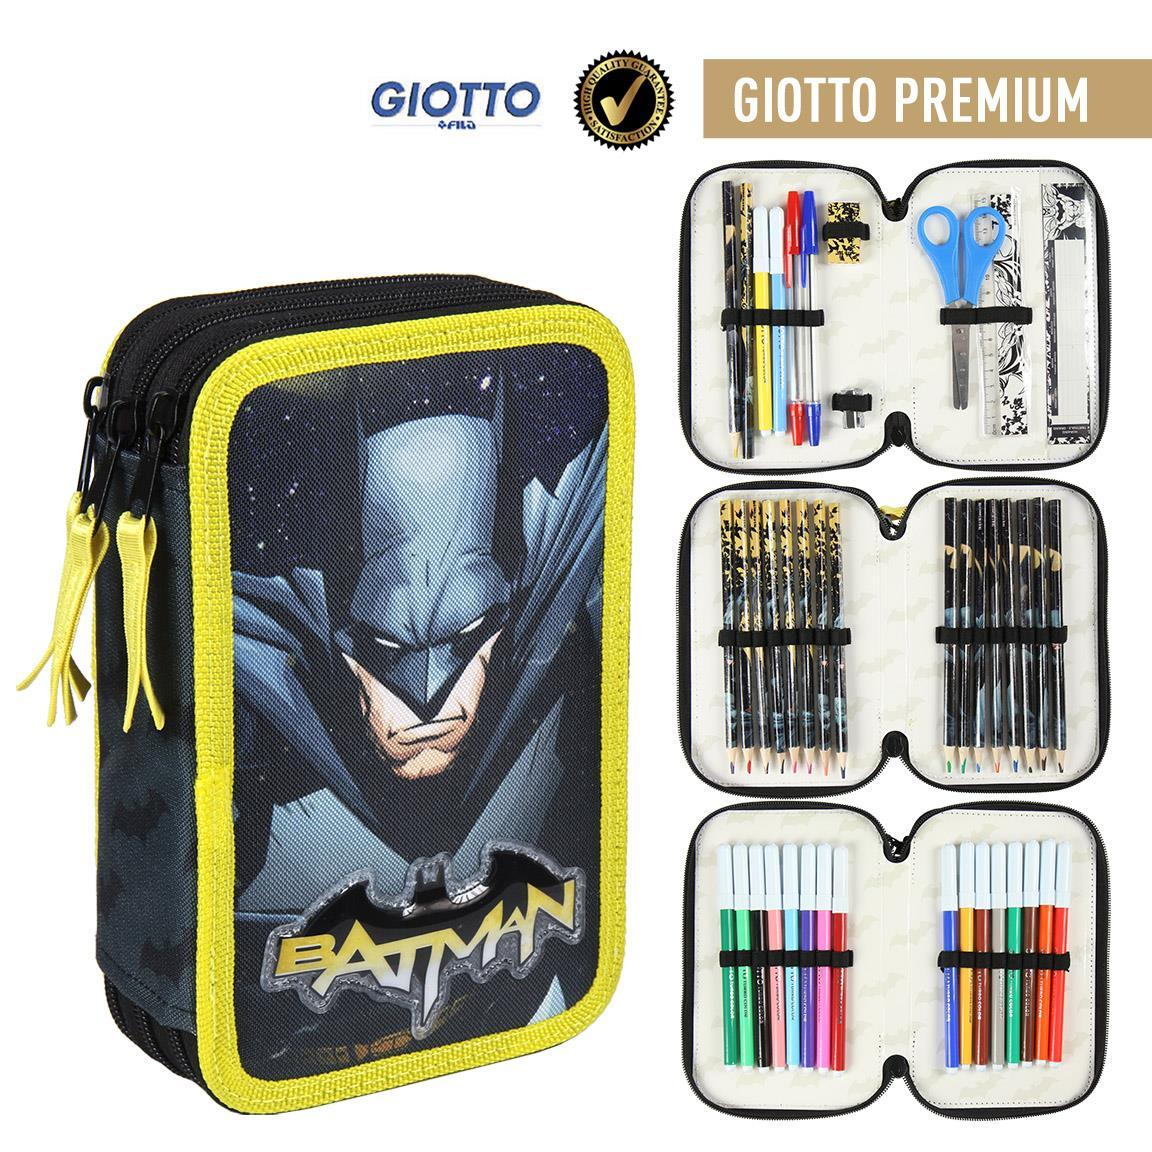 Plumier Triple Giotto Premium Batman Officially Licensed Children Gift Original